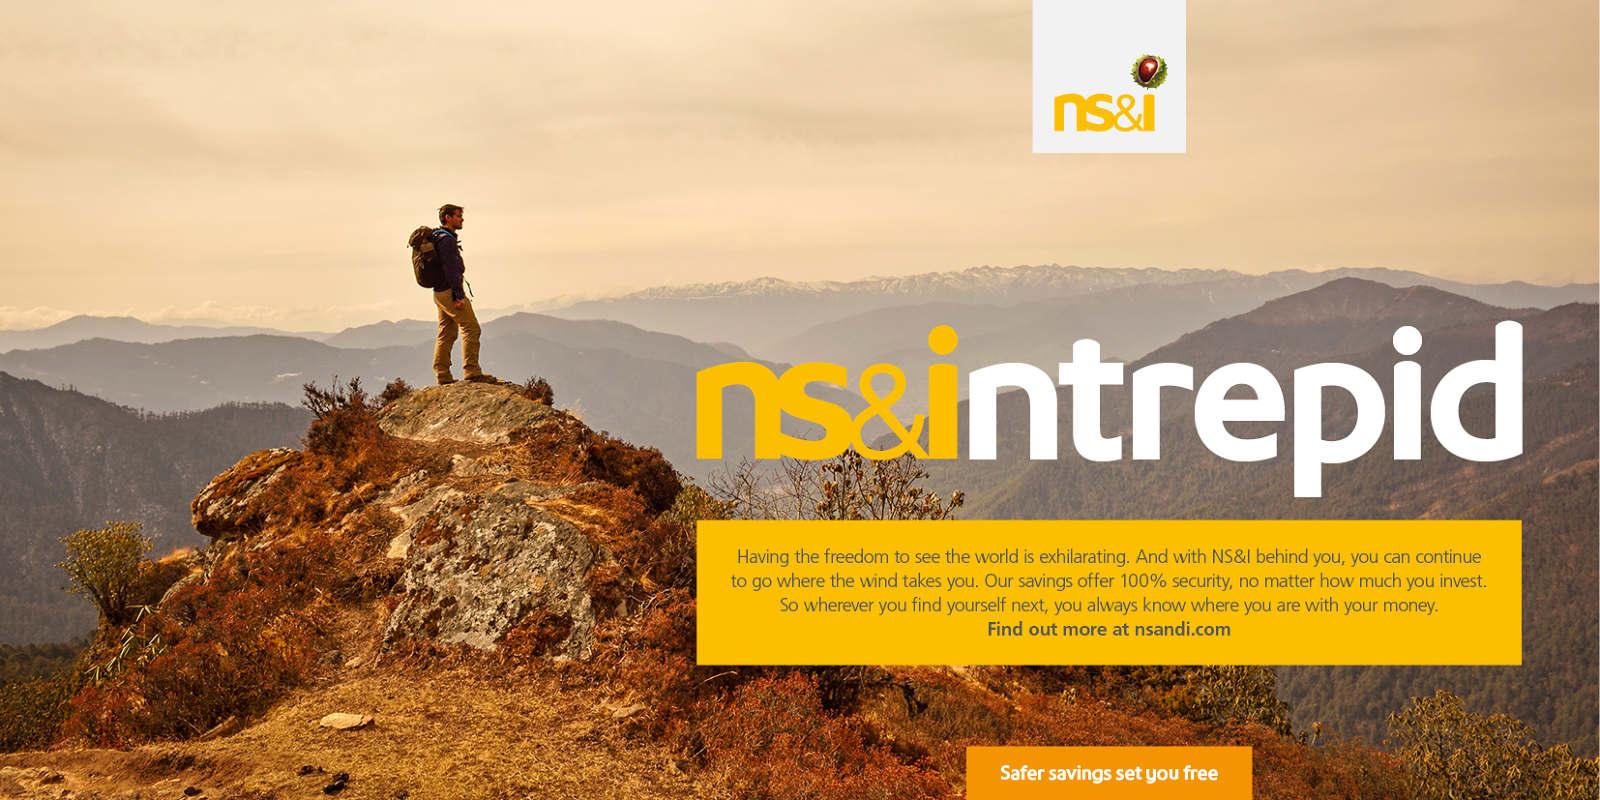 NS&INSPIRE - Jayshree and Chelsey - copywriter art director